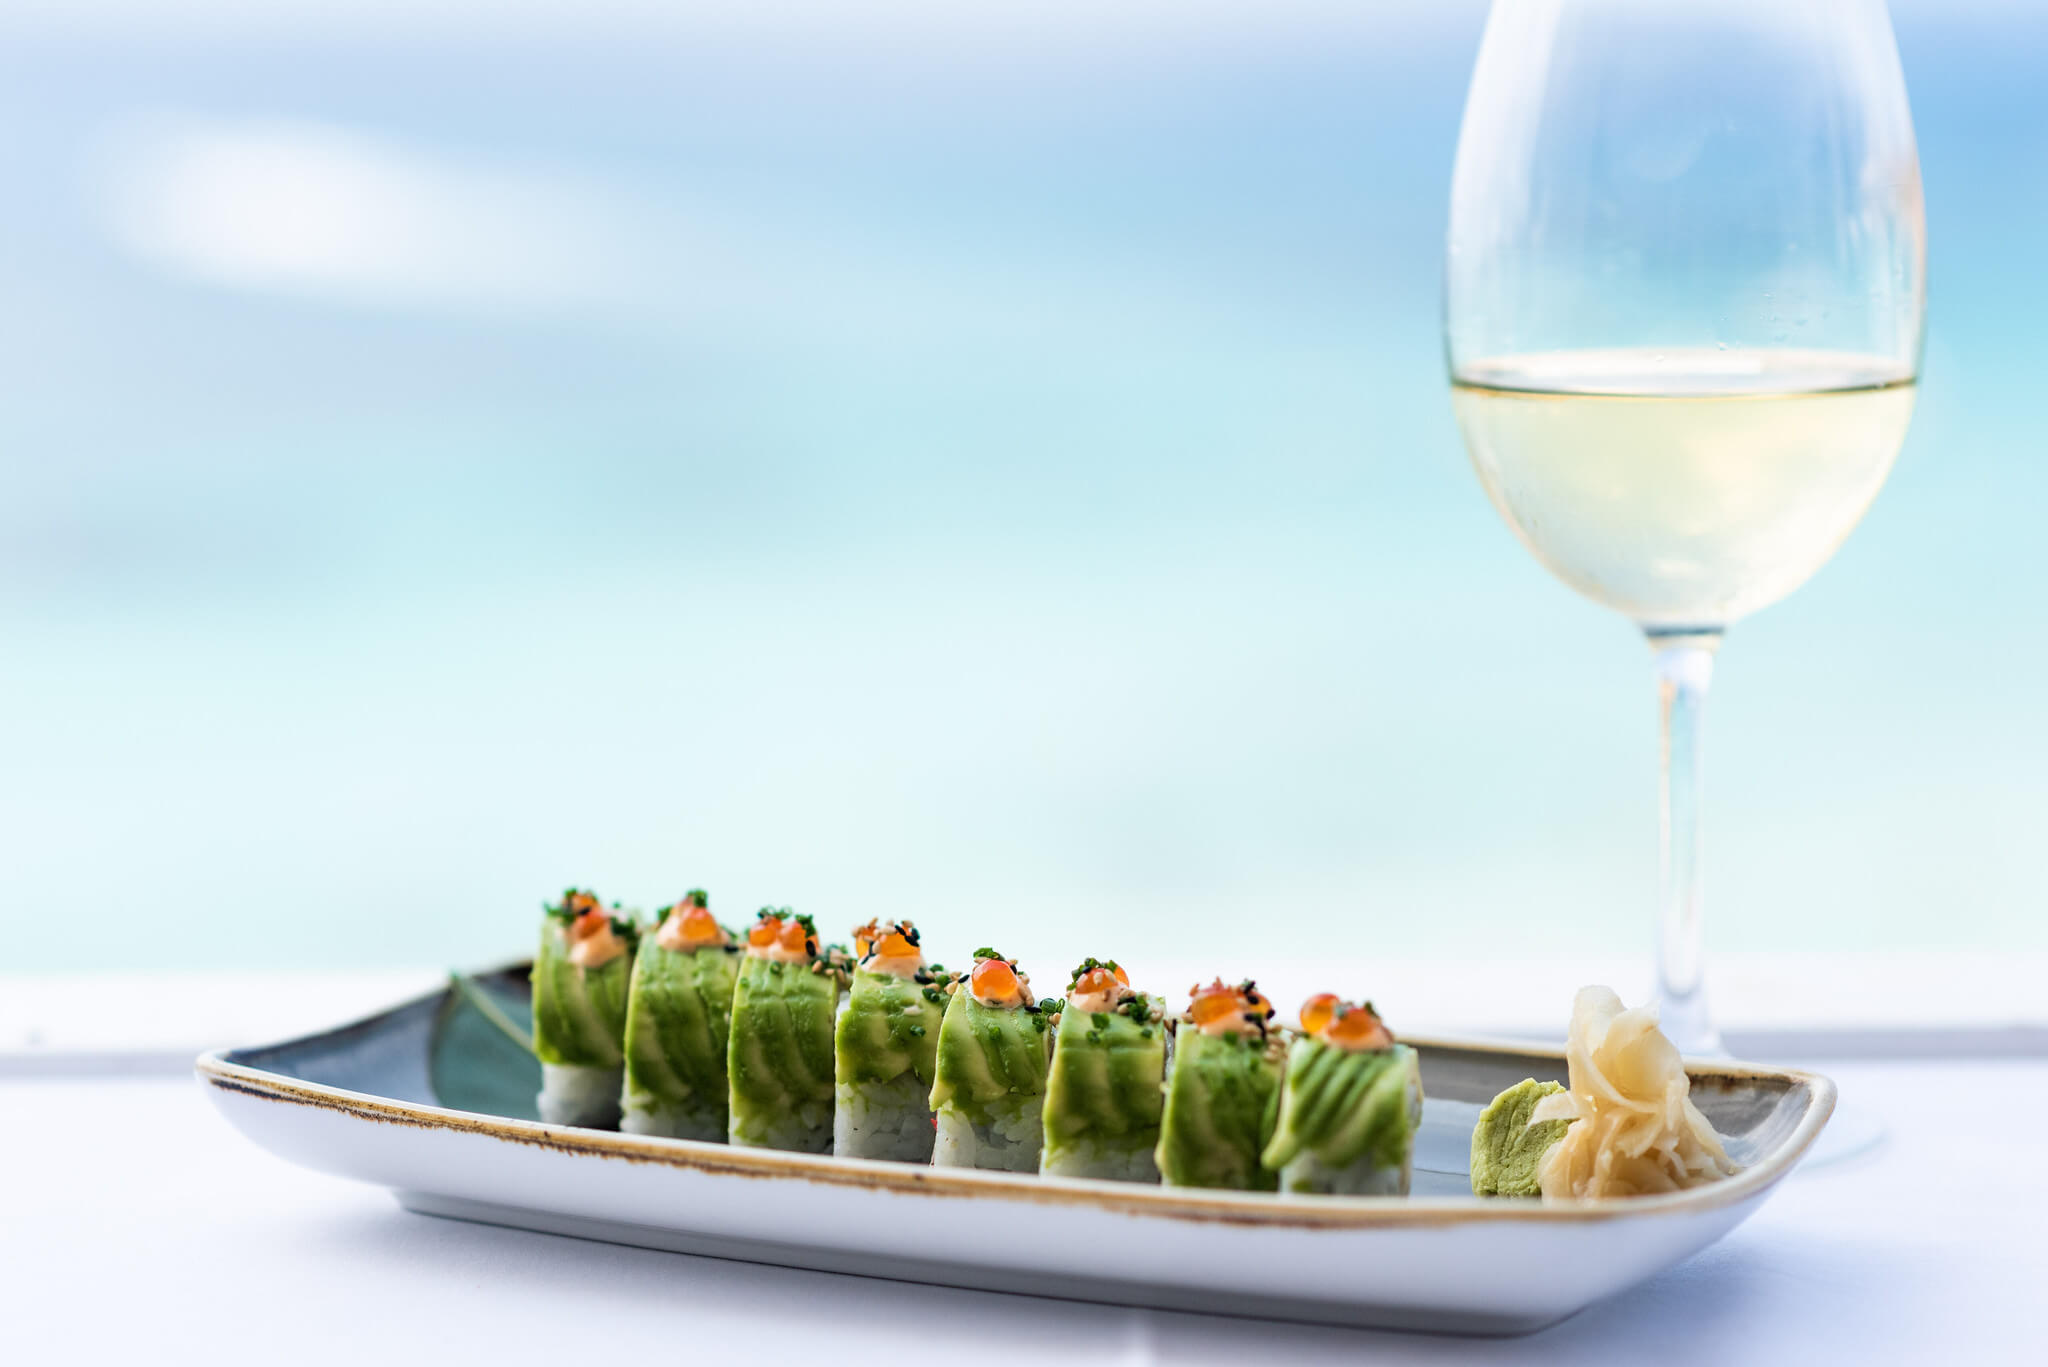 https://www.white-ibiza.com/wp-content/uploads/2020/03/ibiza-beach-restaurant-cotton-beach-club-2020-00.jpg